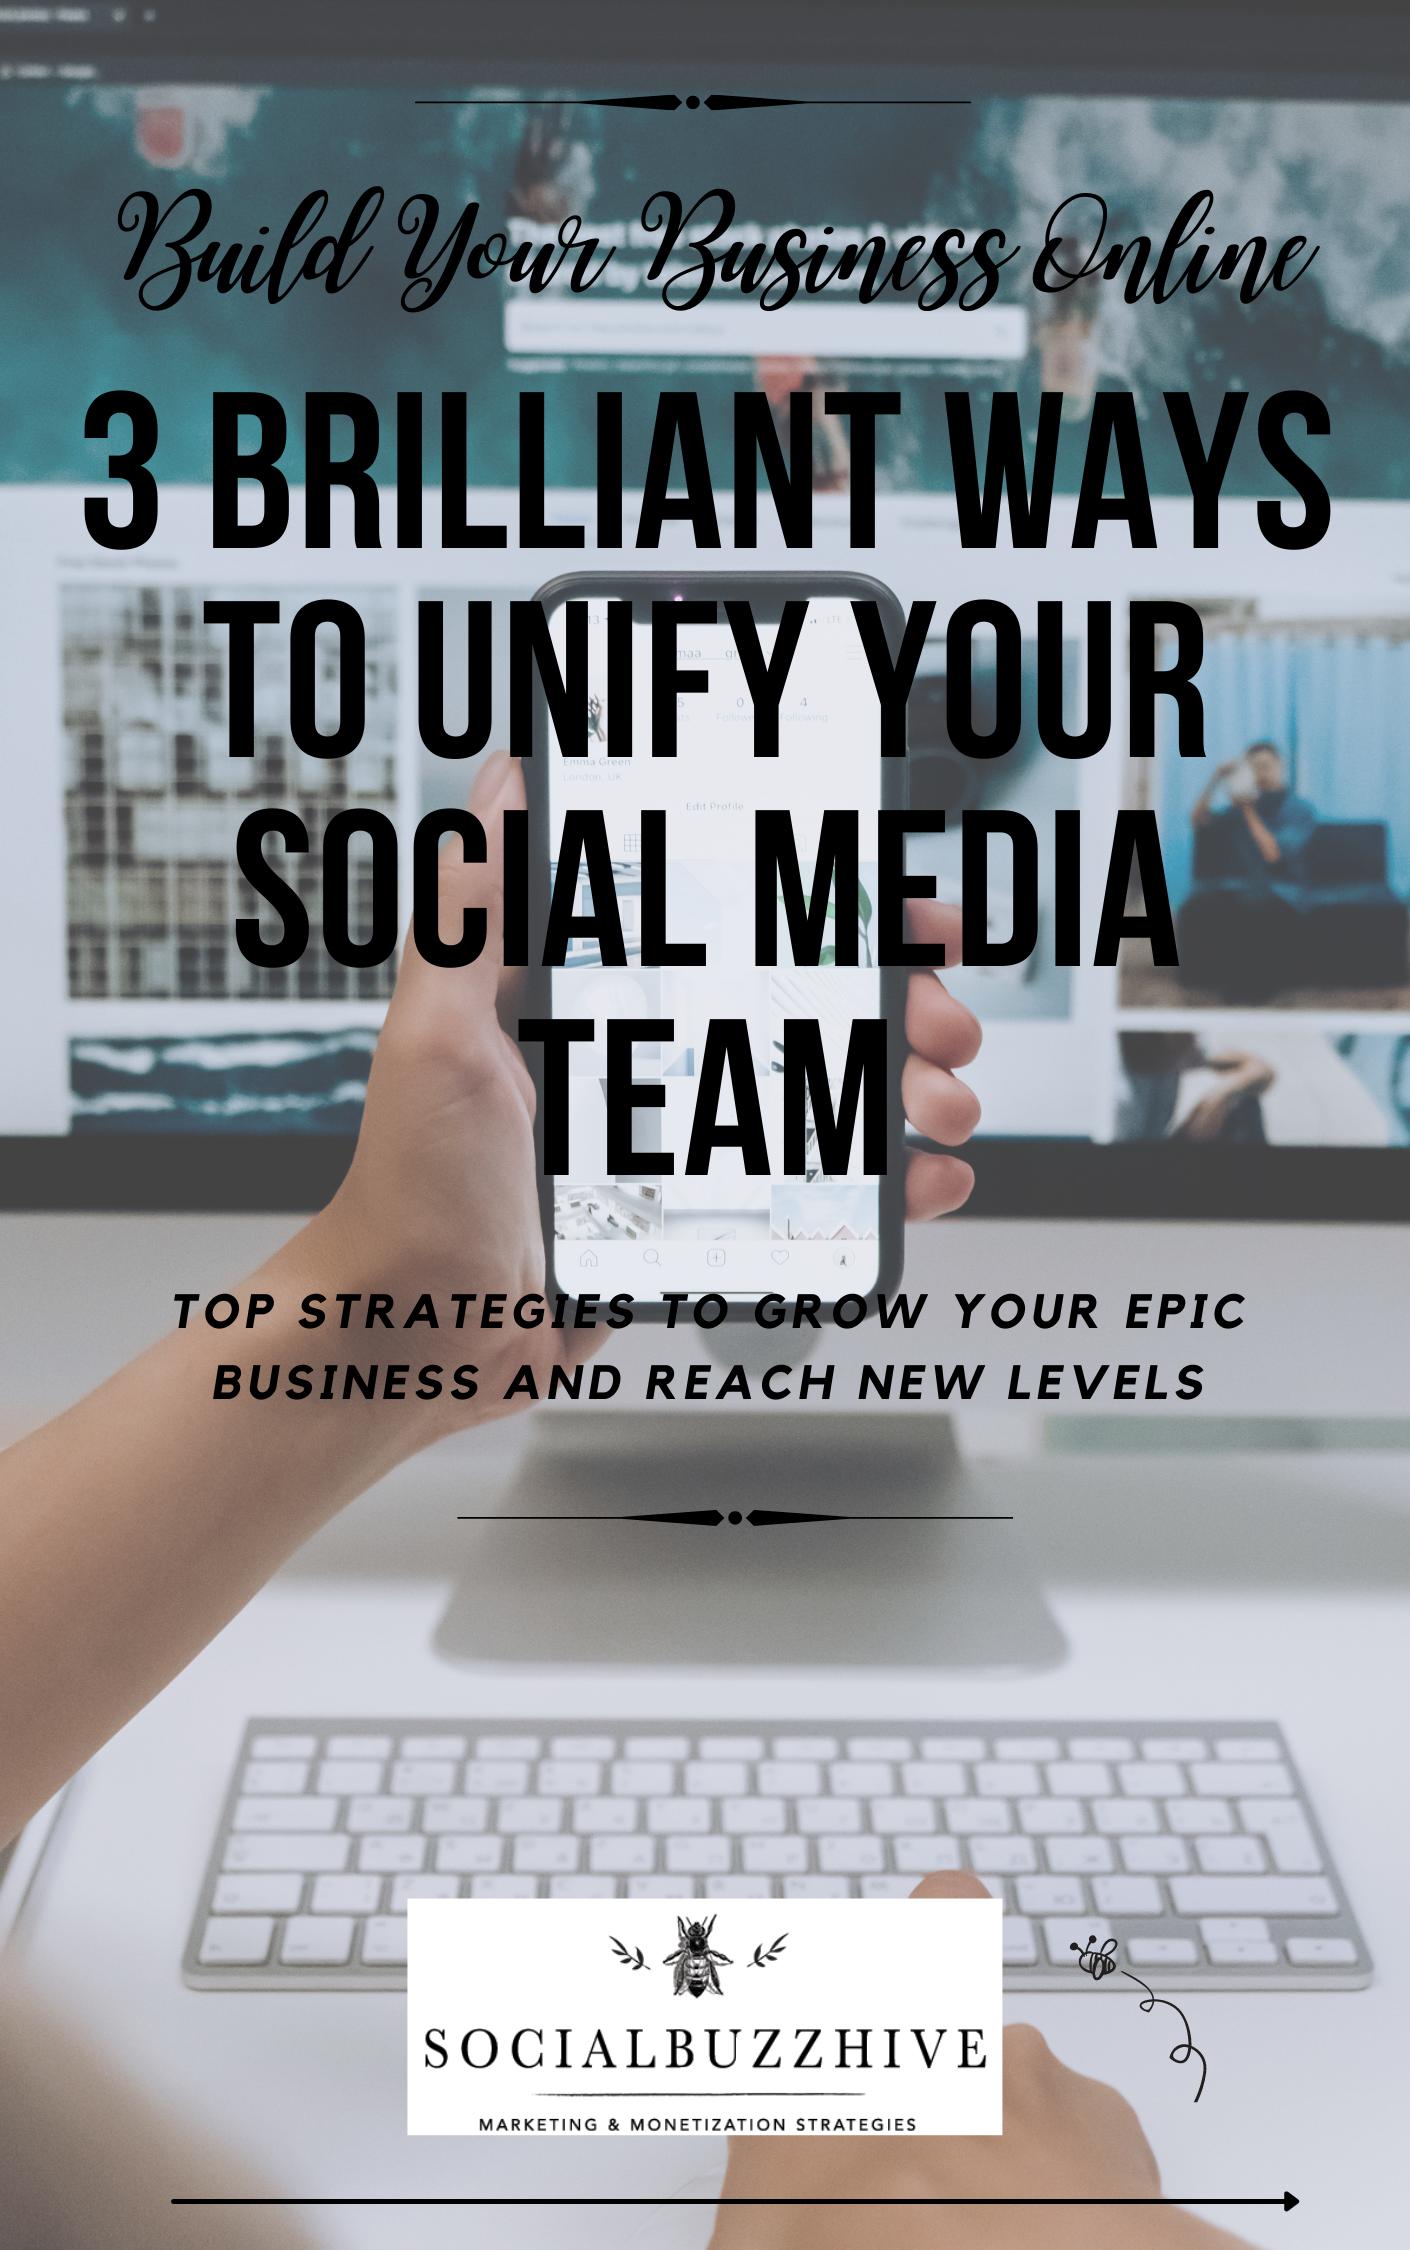 3 brilliant ways to unify your social media marketing team